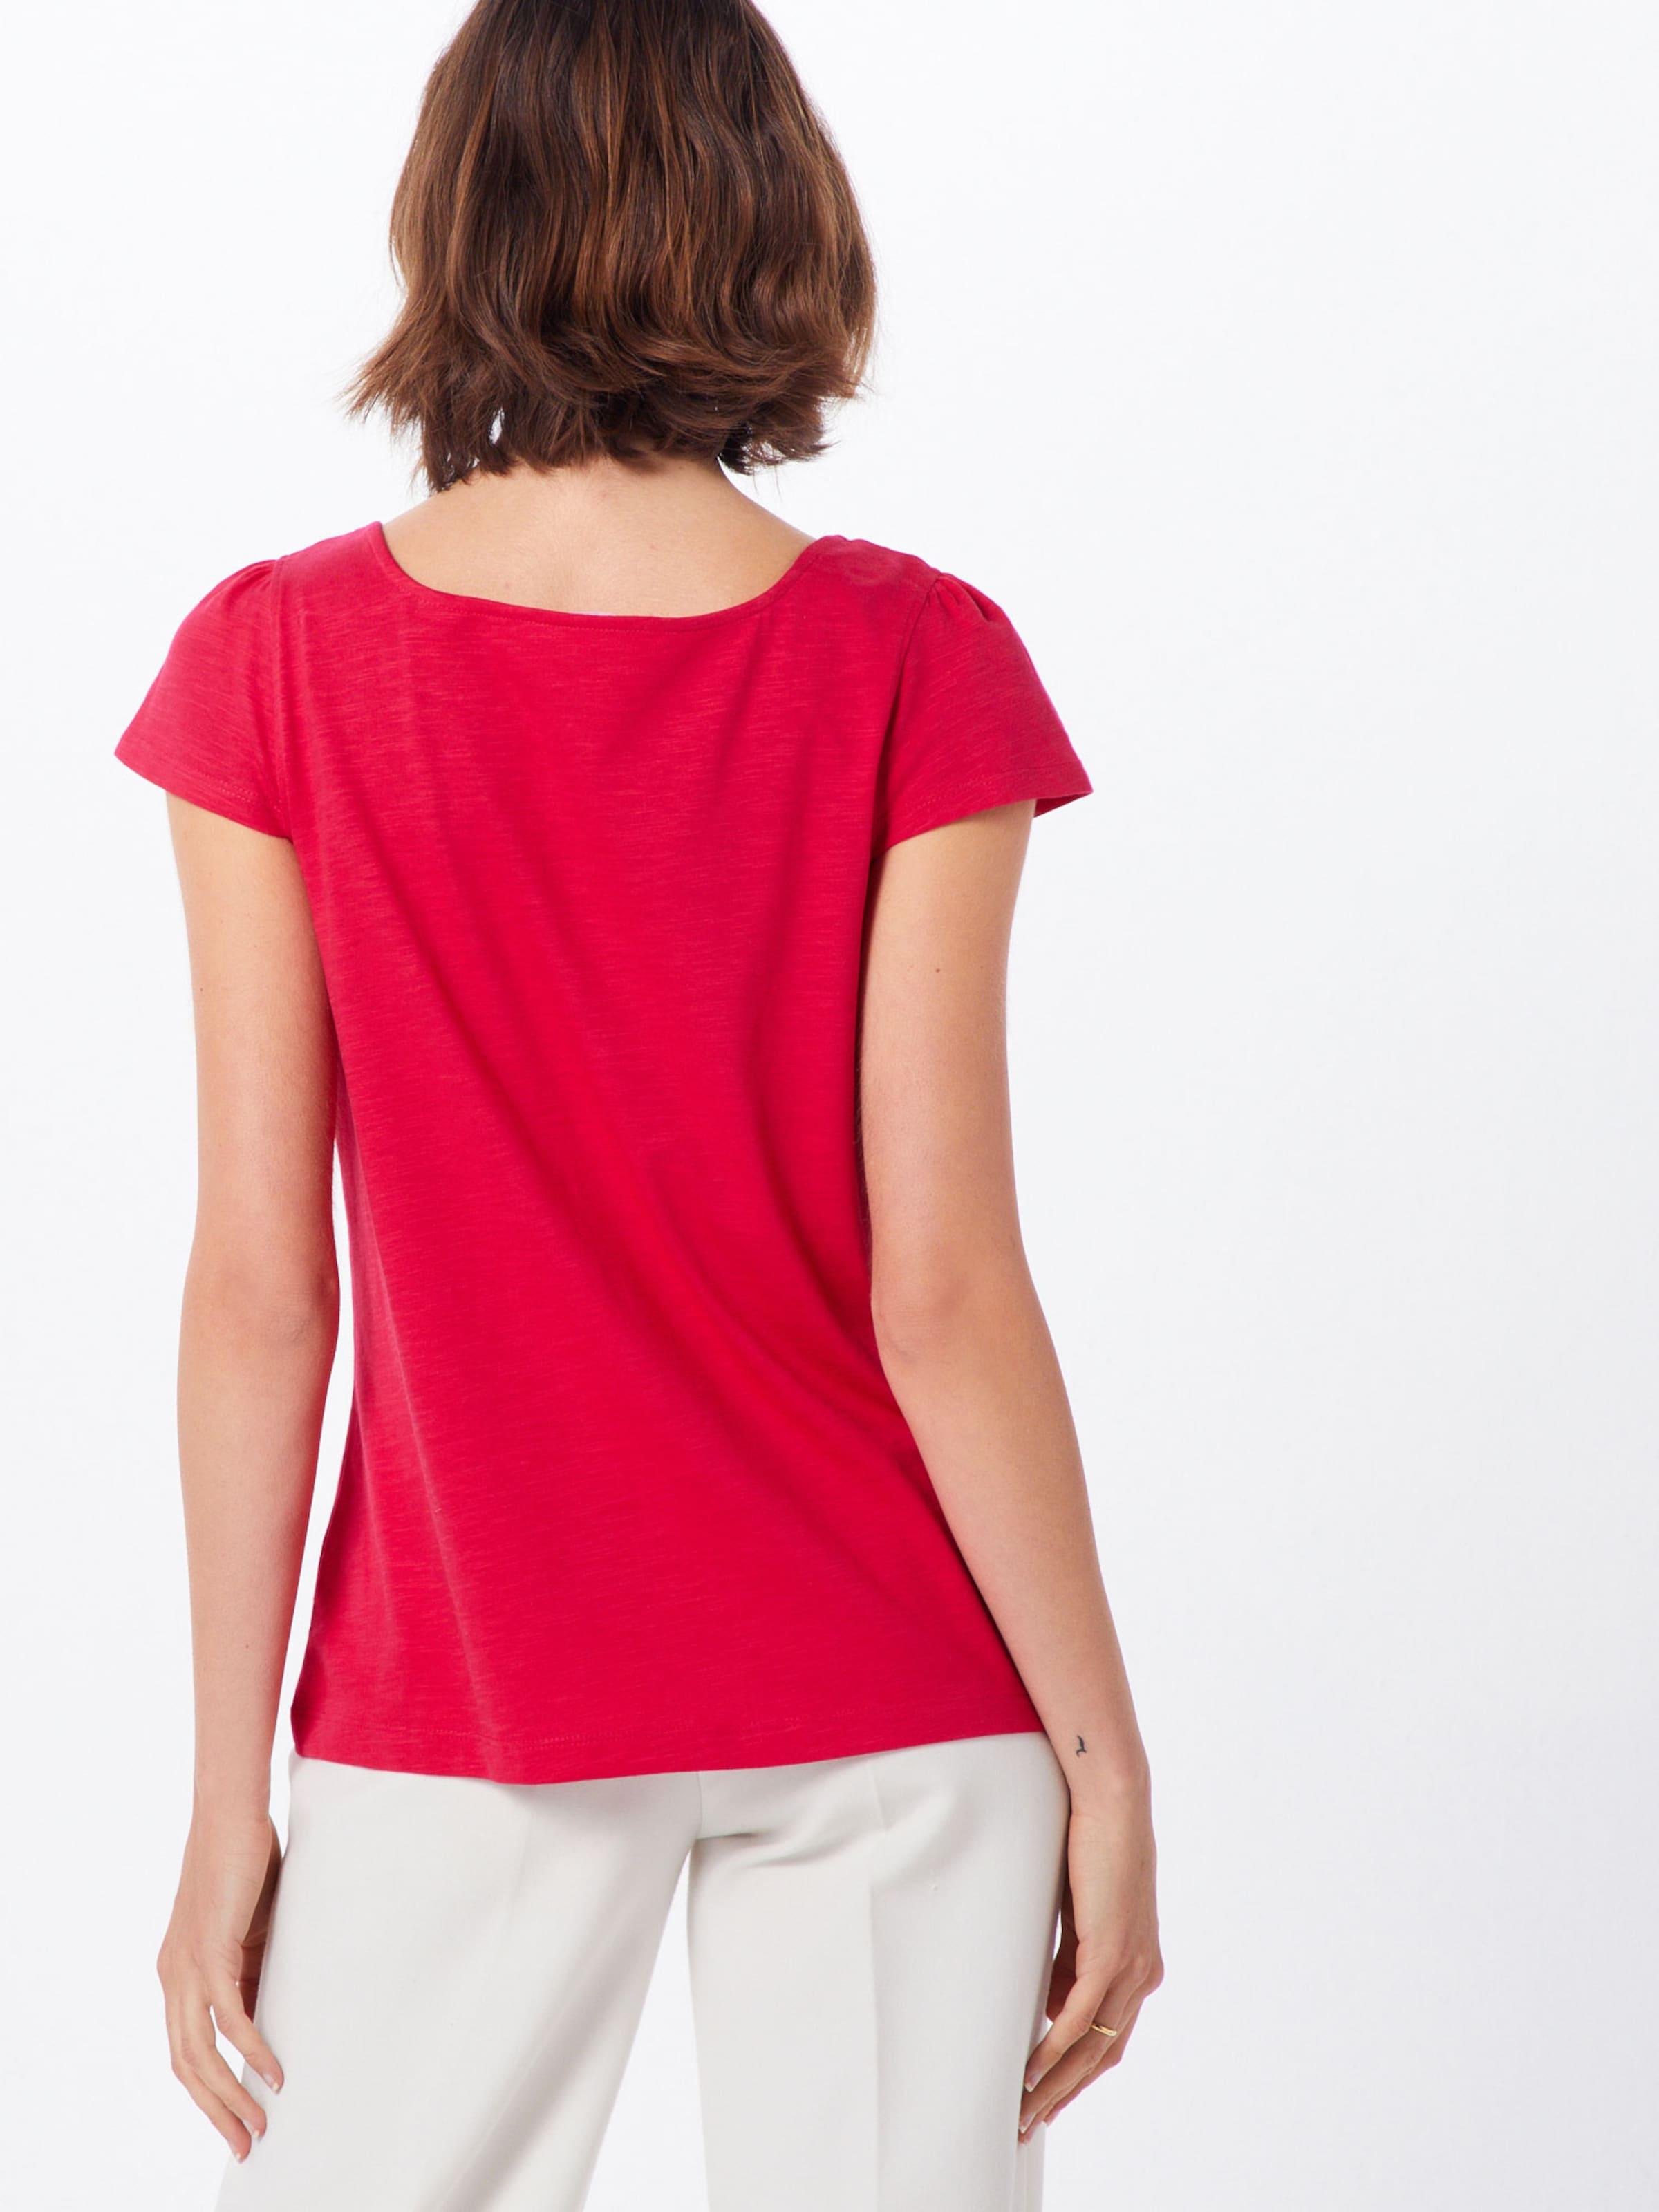 Dunkelpink S oliver shirt In T OP0XNnZ8wk